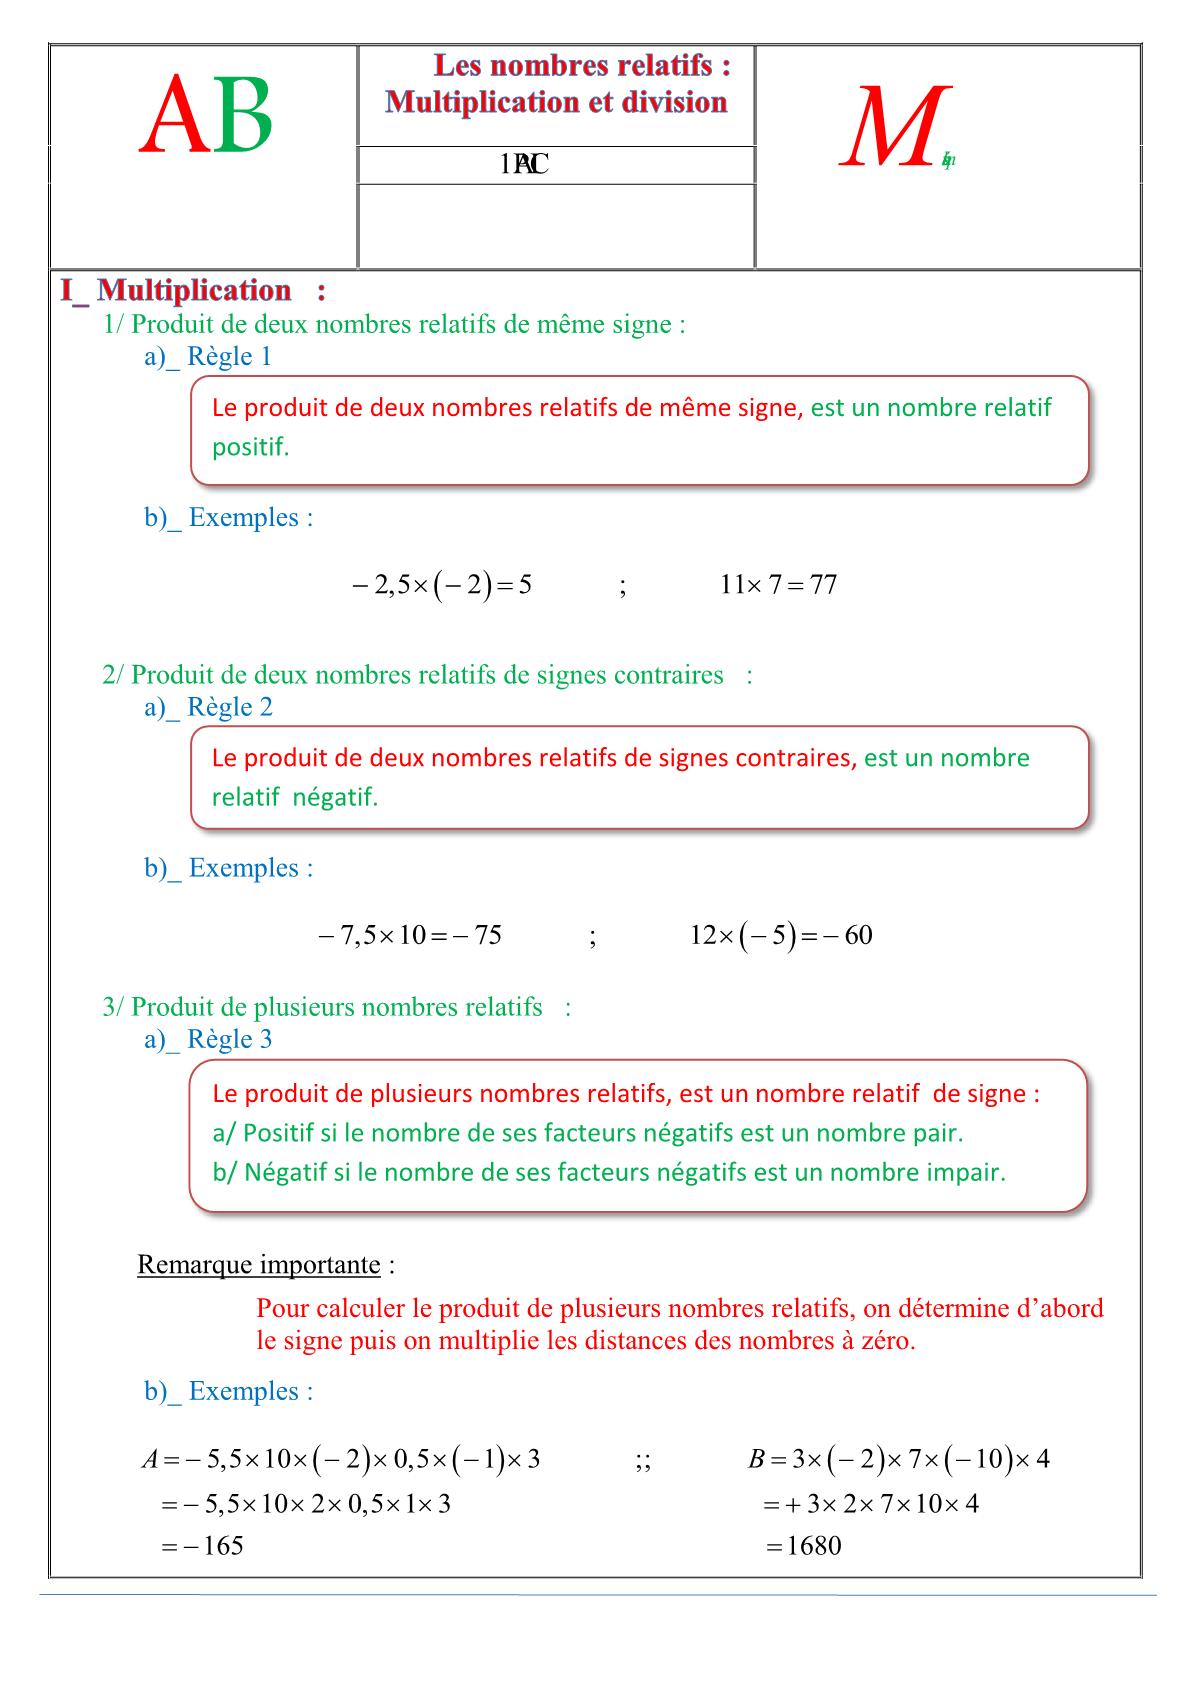 درس la multiplications et la divisions des nombres relatifs للسنة الأولى اعدادي